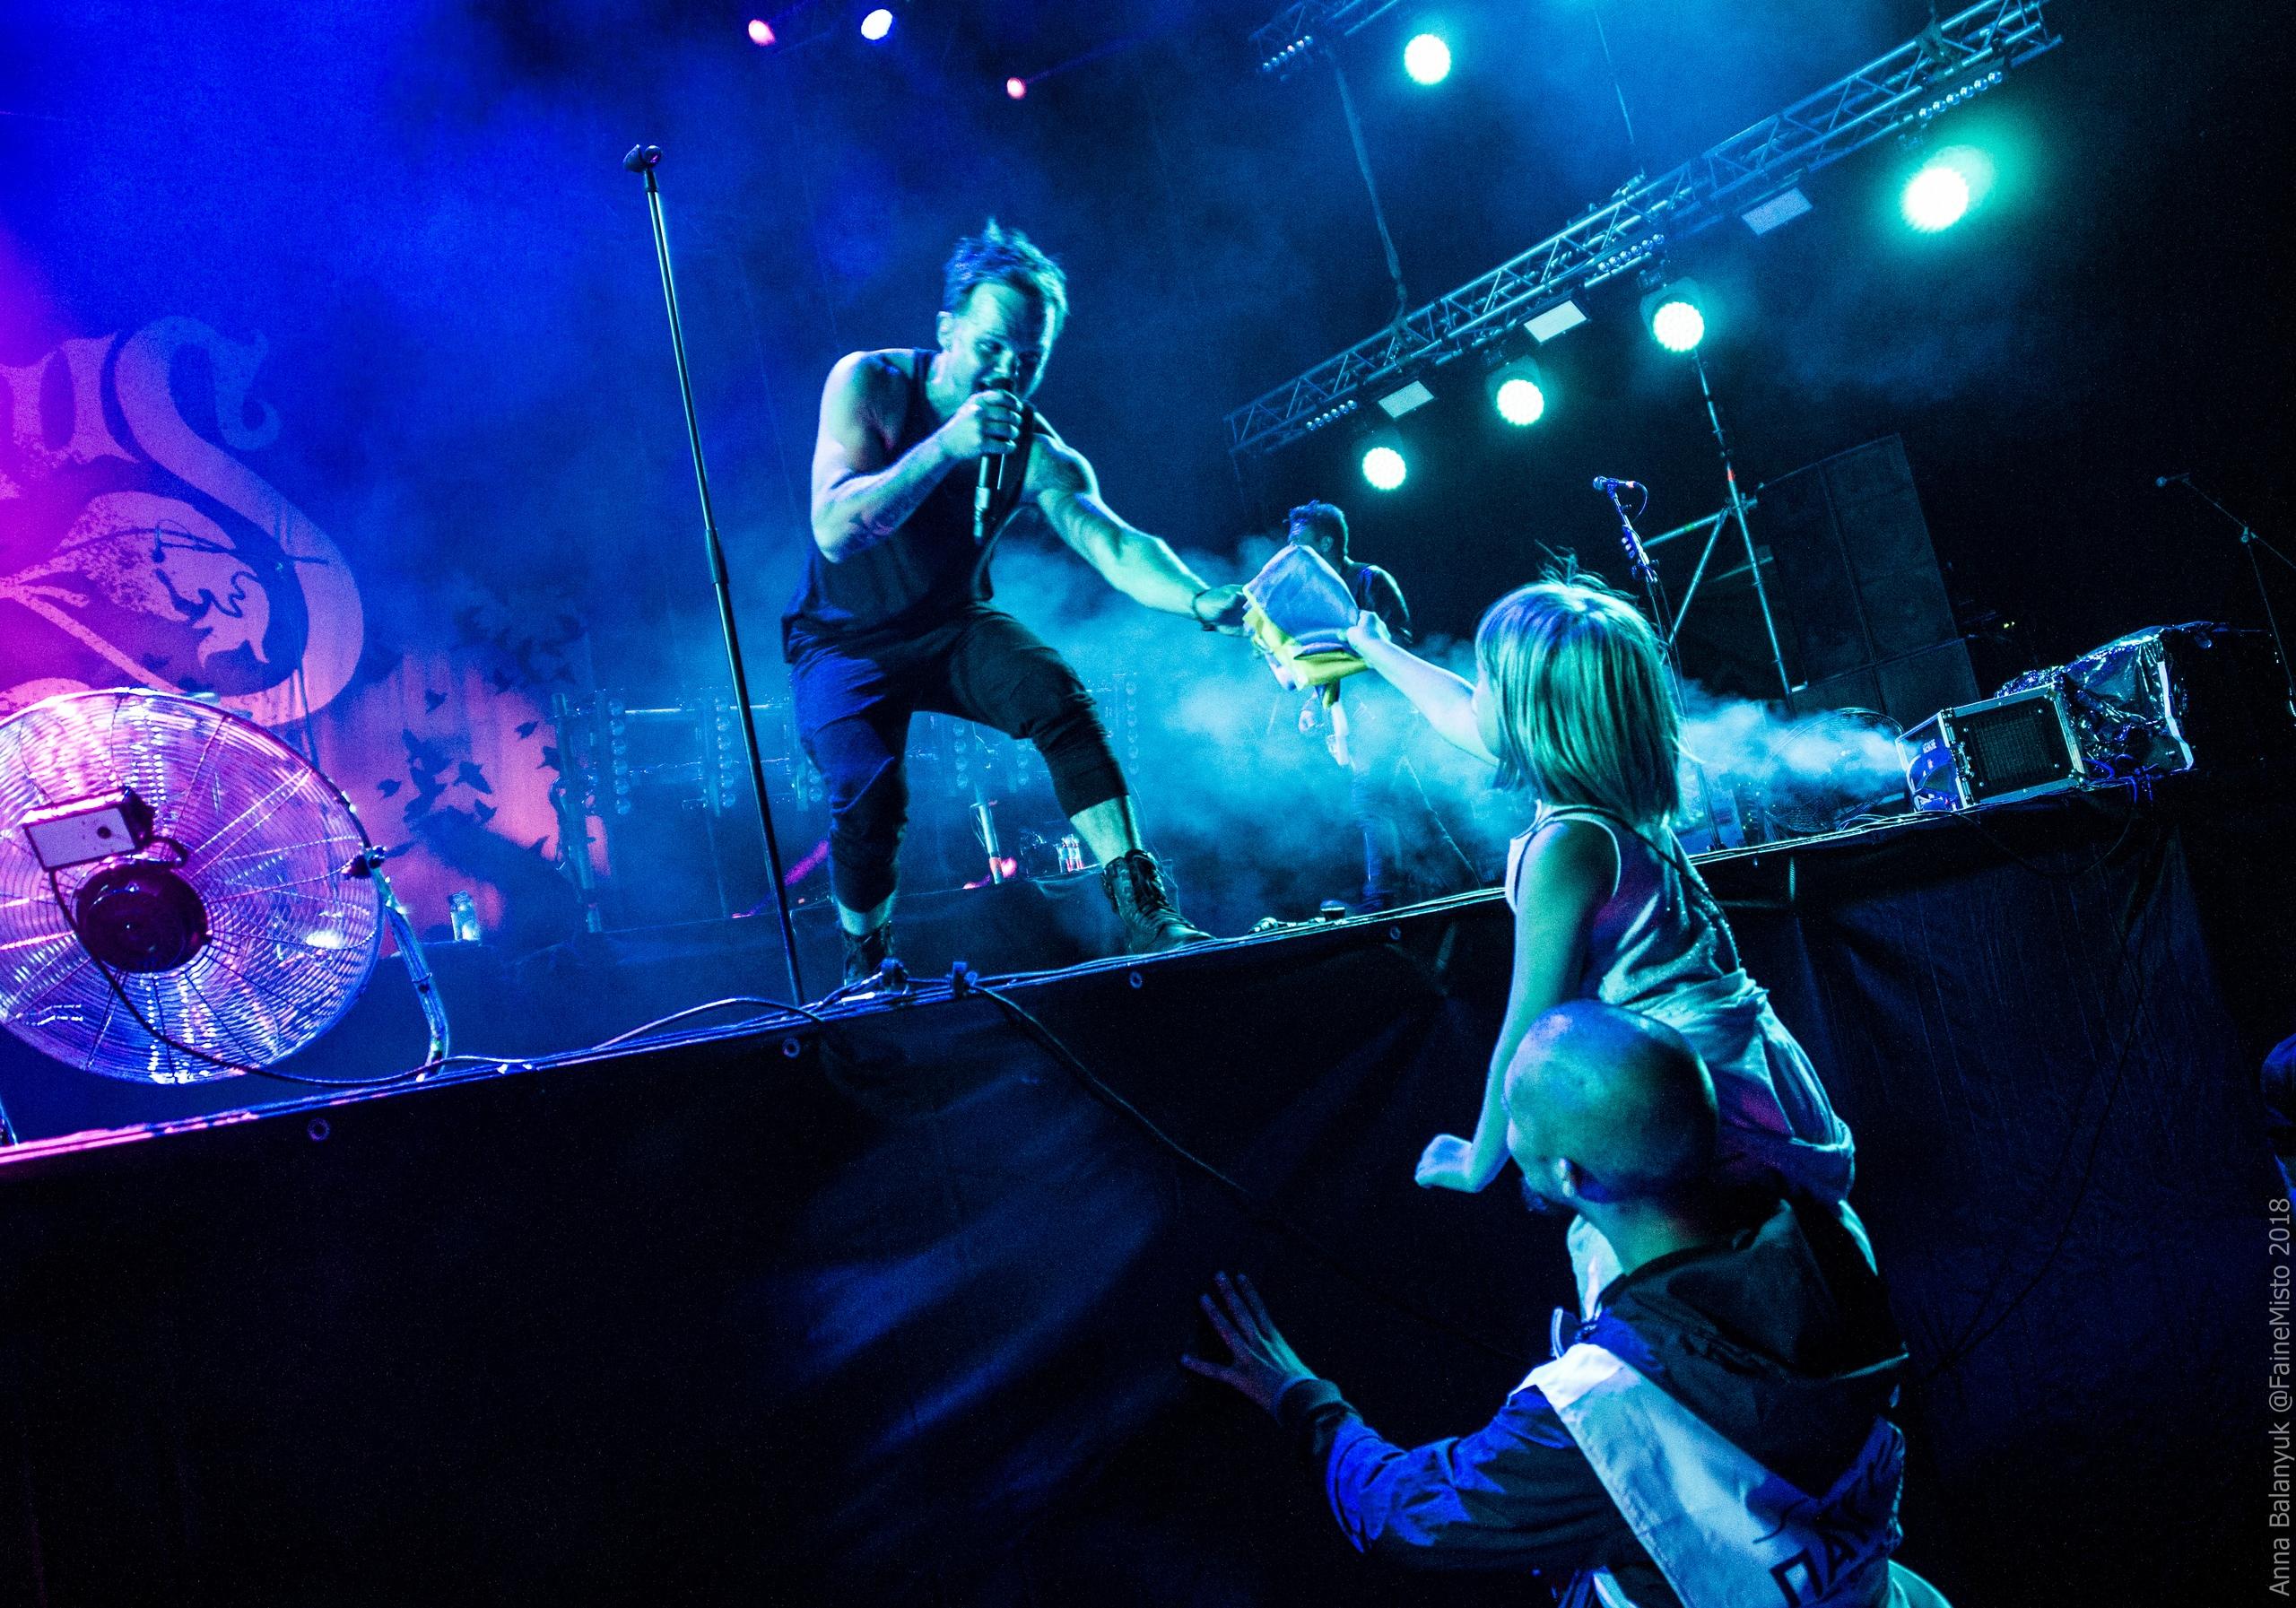 vHcfPDtVgu4 Фестиваль — UA MUSIC | Енциклопедія української музики